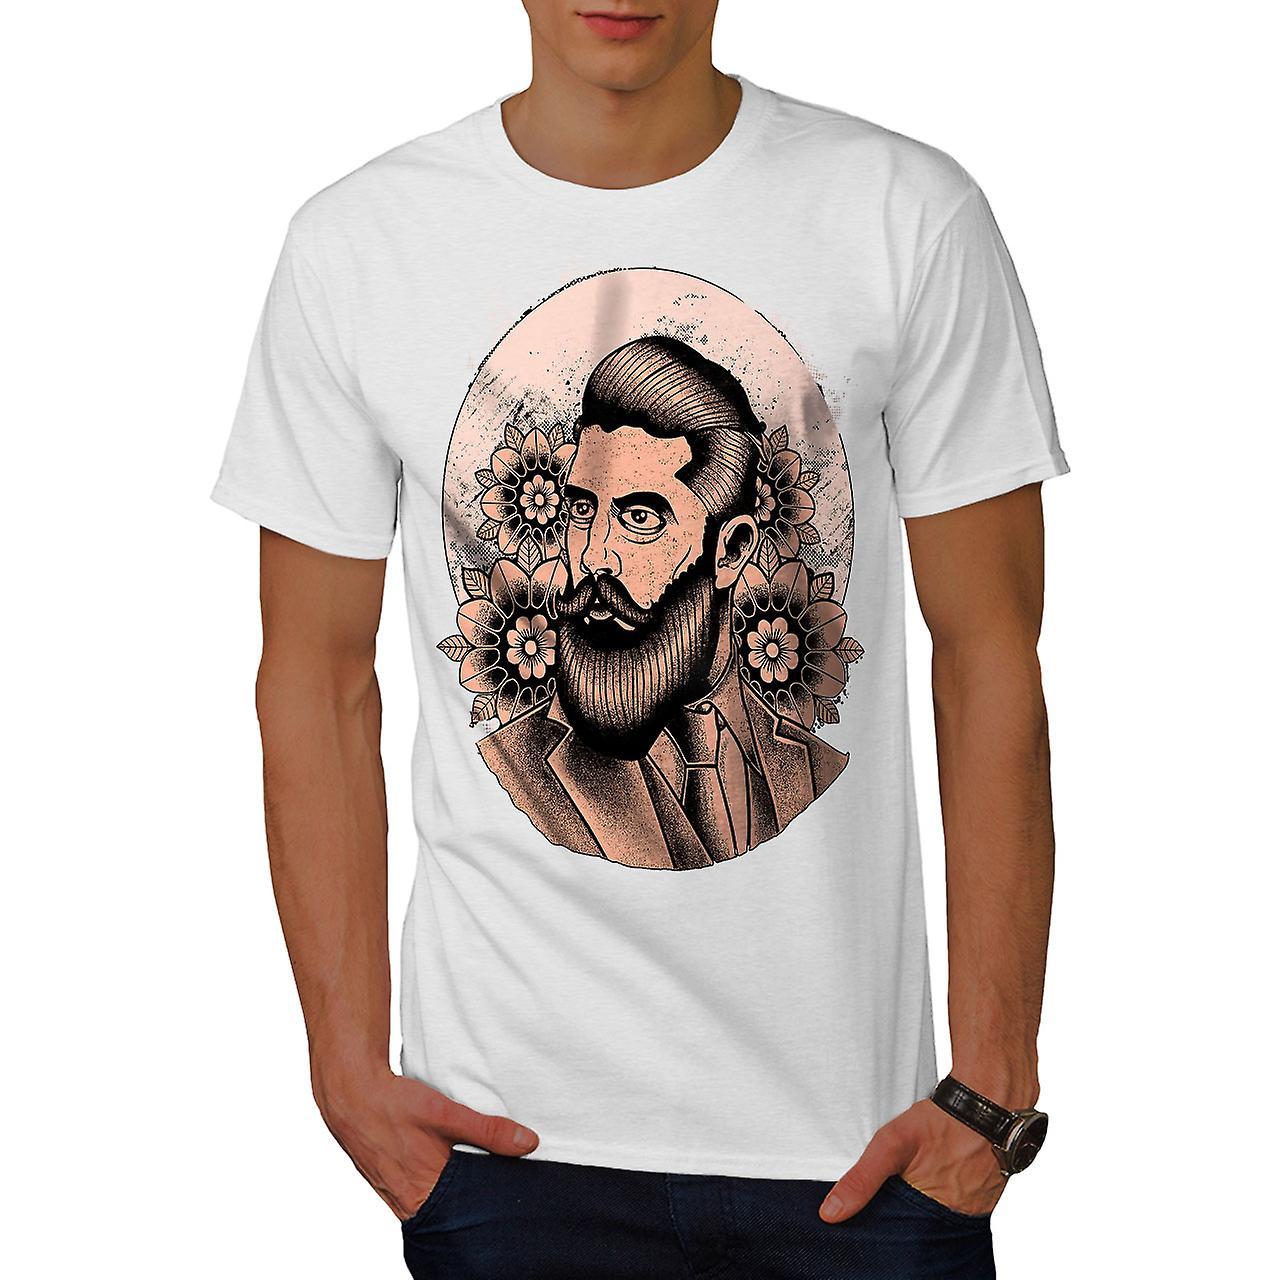 beard hipster vintage men white t shirt wellcoda fruugo. Black Bedroom Furniture Sets. Home Design Ideas